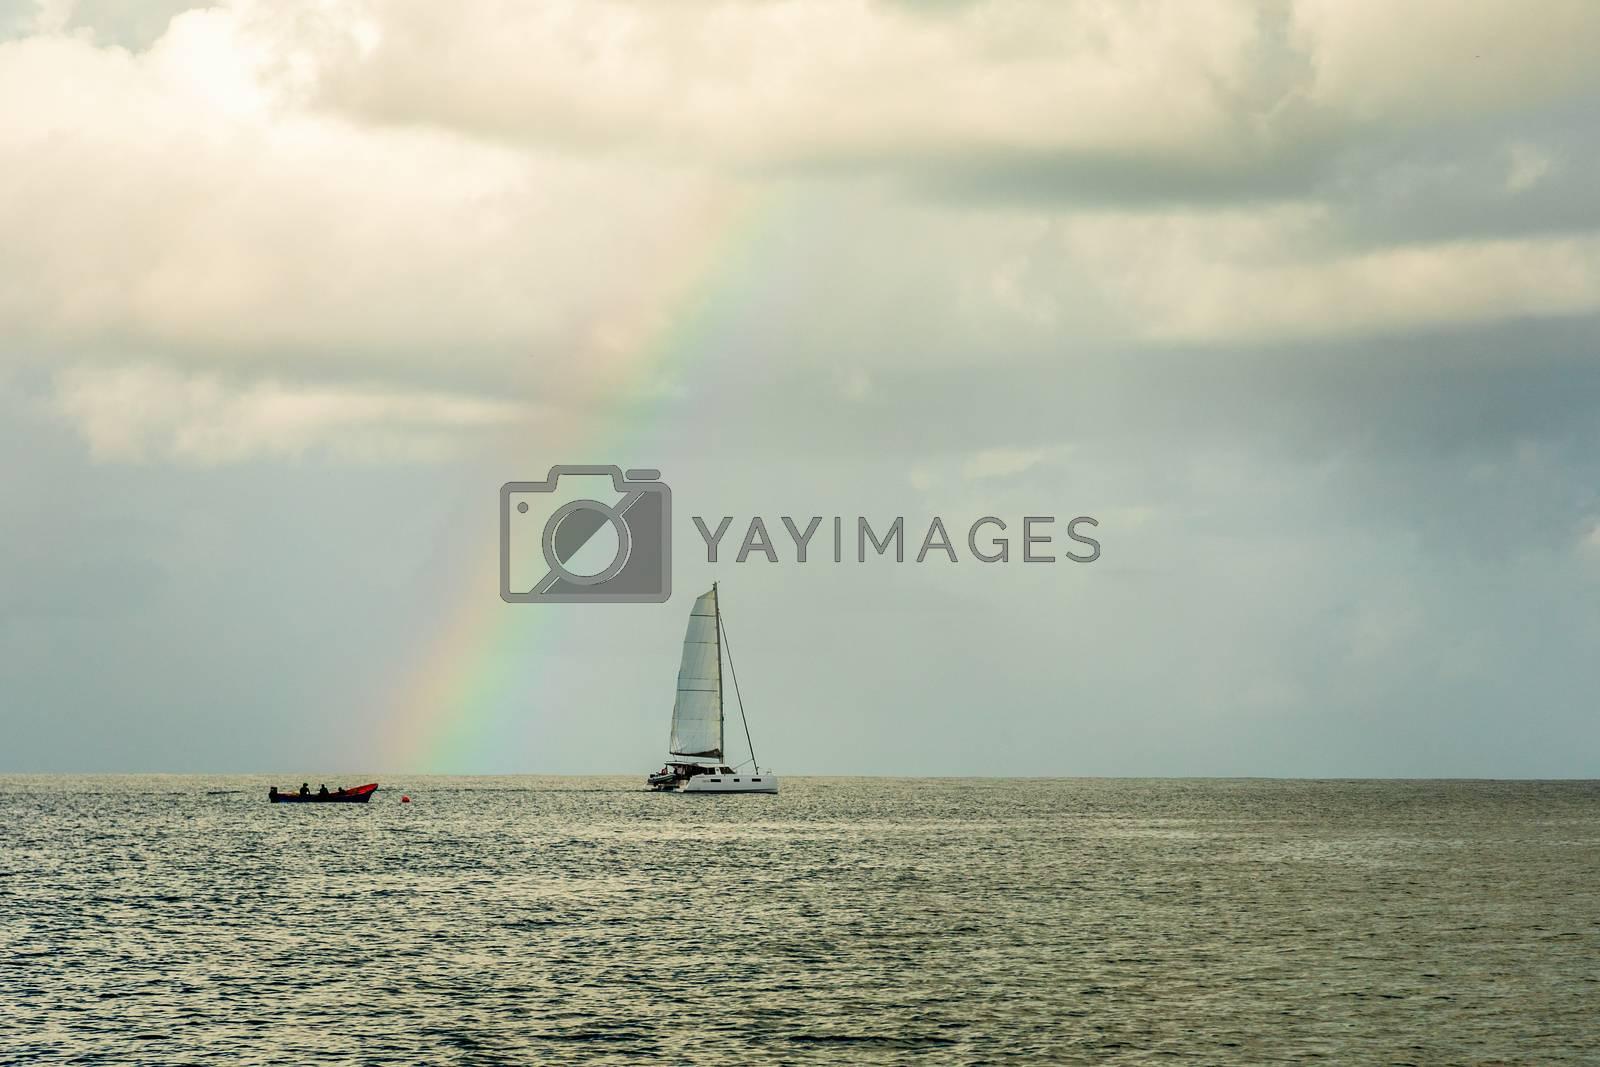 Catamaran at Rodney bay with rainbow in the backround, Saint Lucia, Caribbean sea